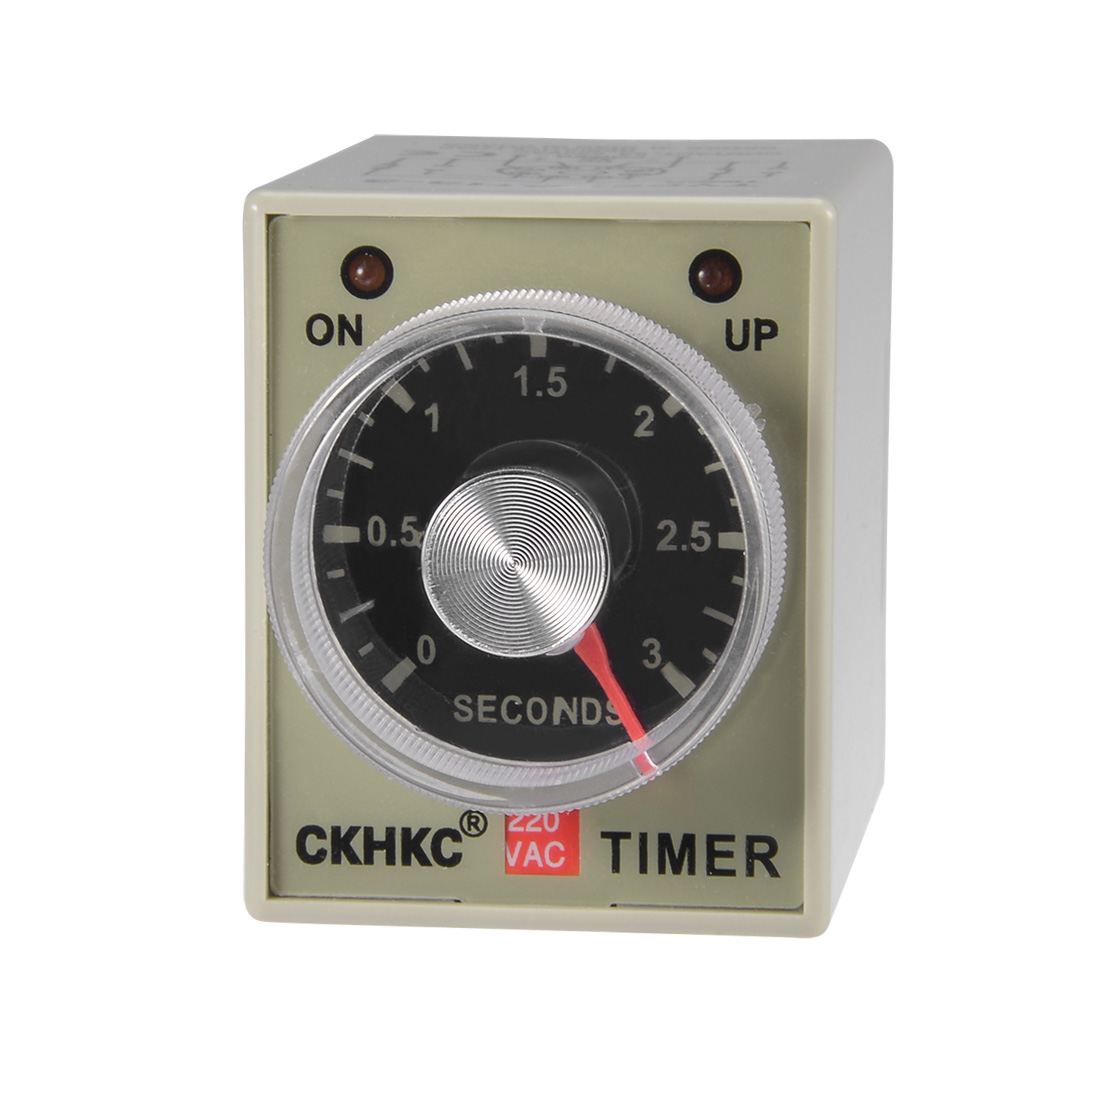 AC220V 3s 8 Terminals Range Adjustable Delay Timer Time Relay AH3-3